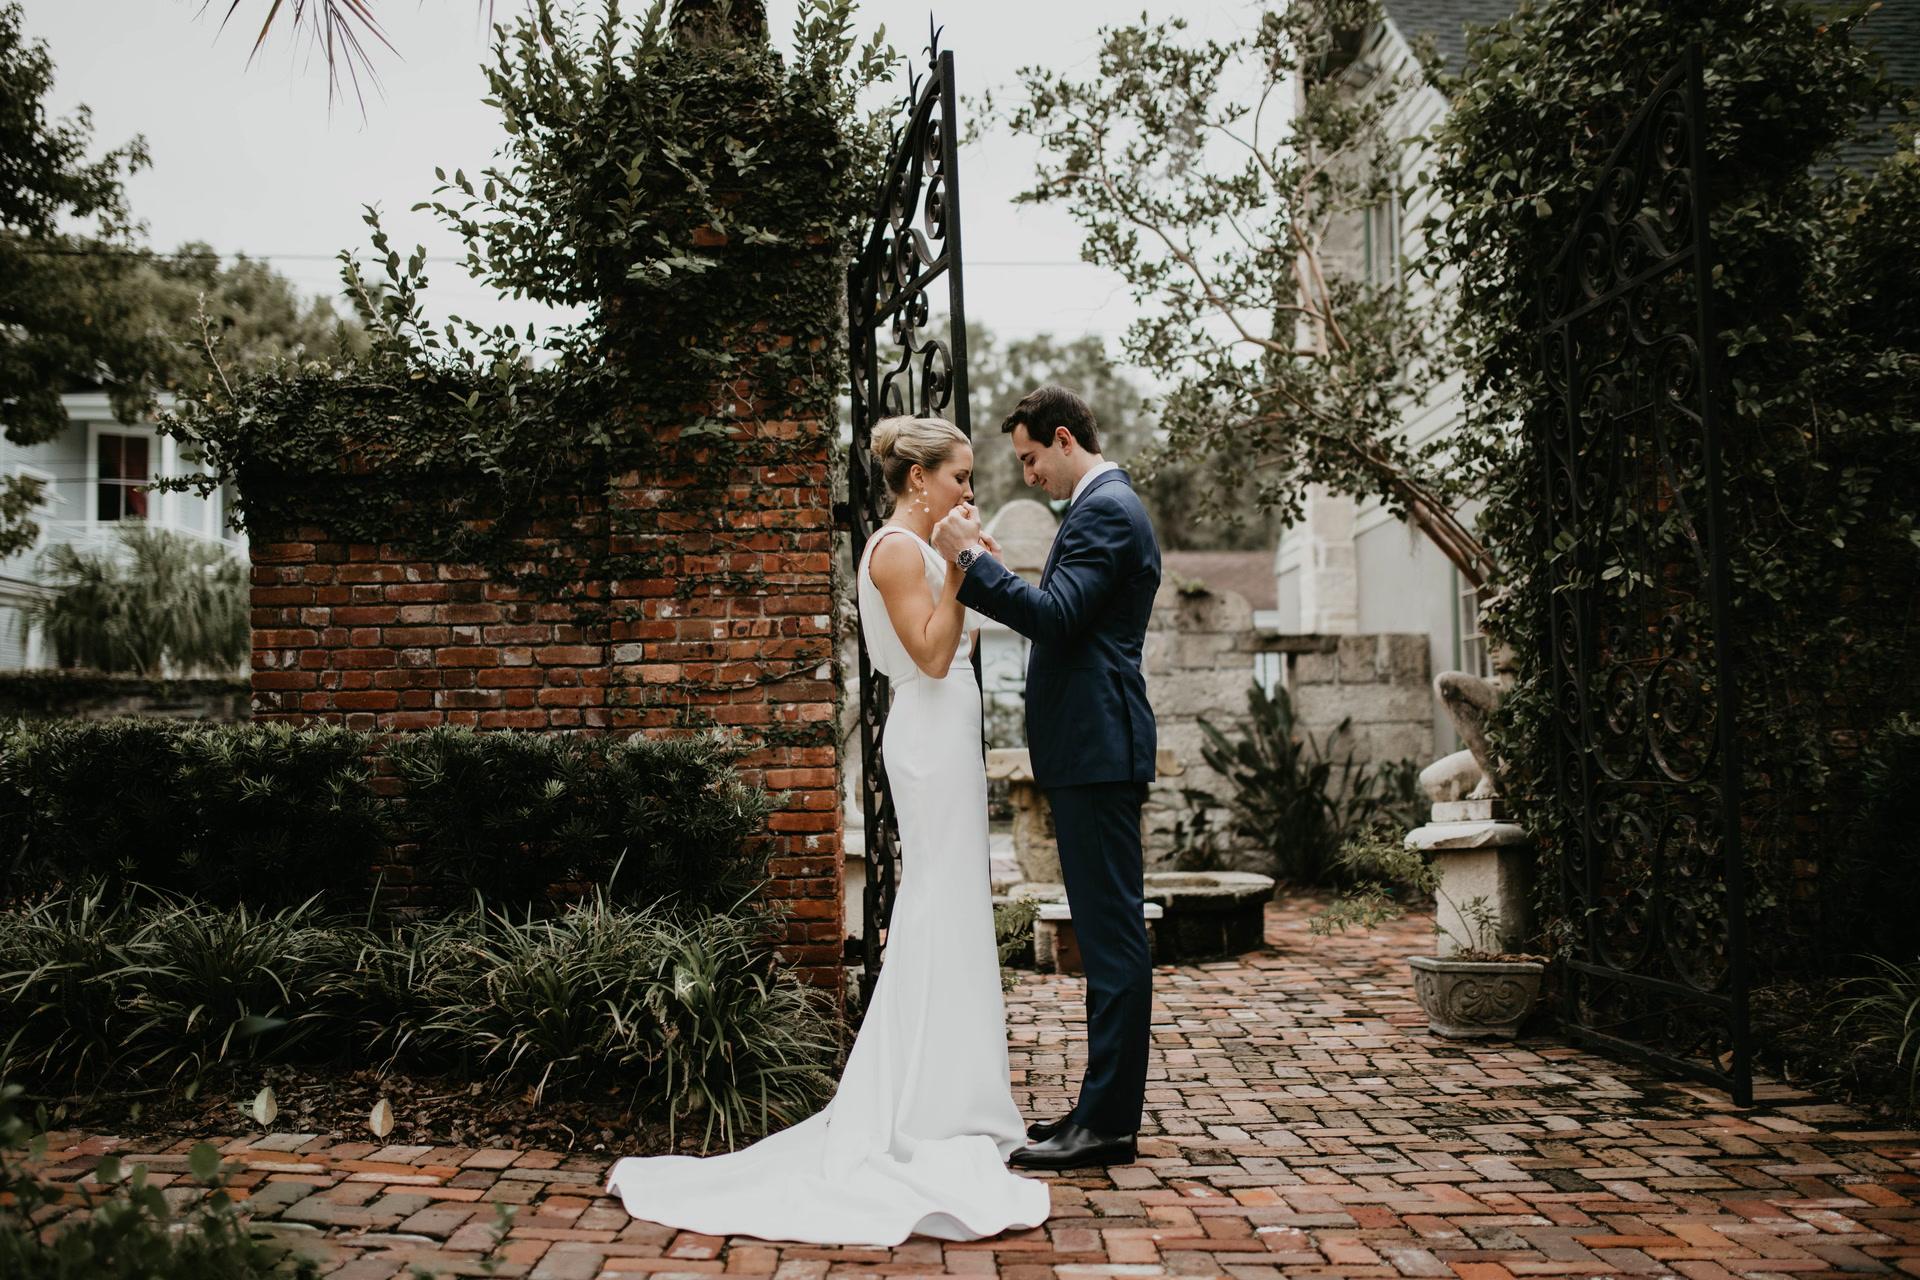 Katherine + Maxim | St. Augustine, Florida | The White Room